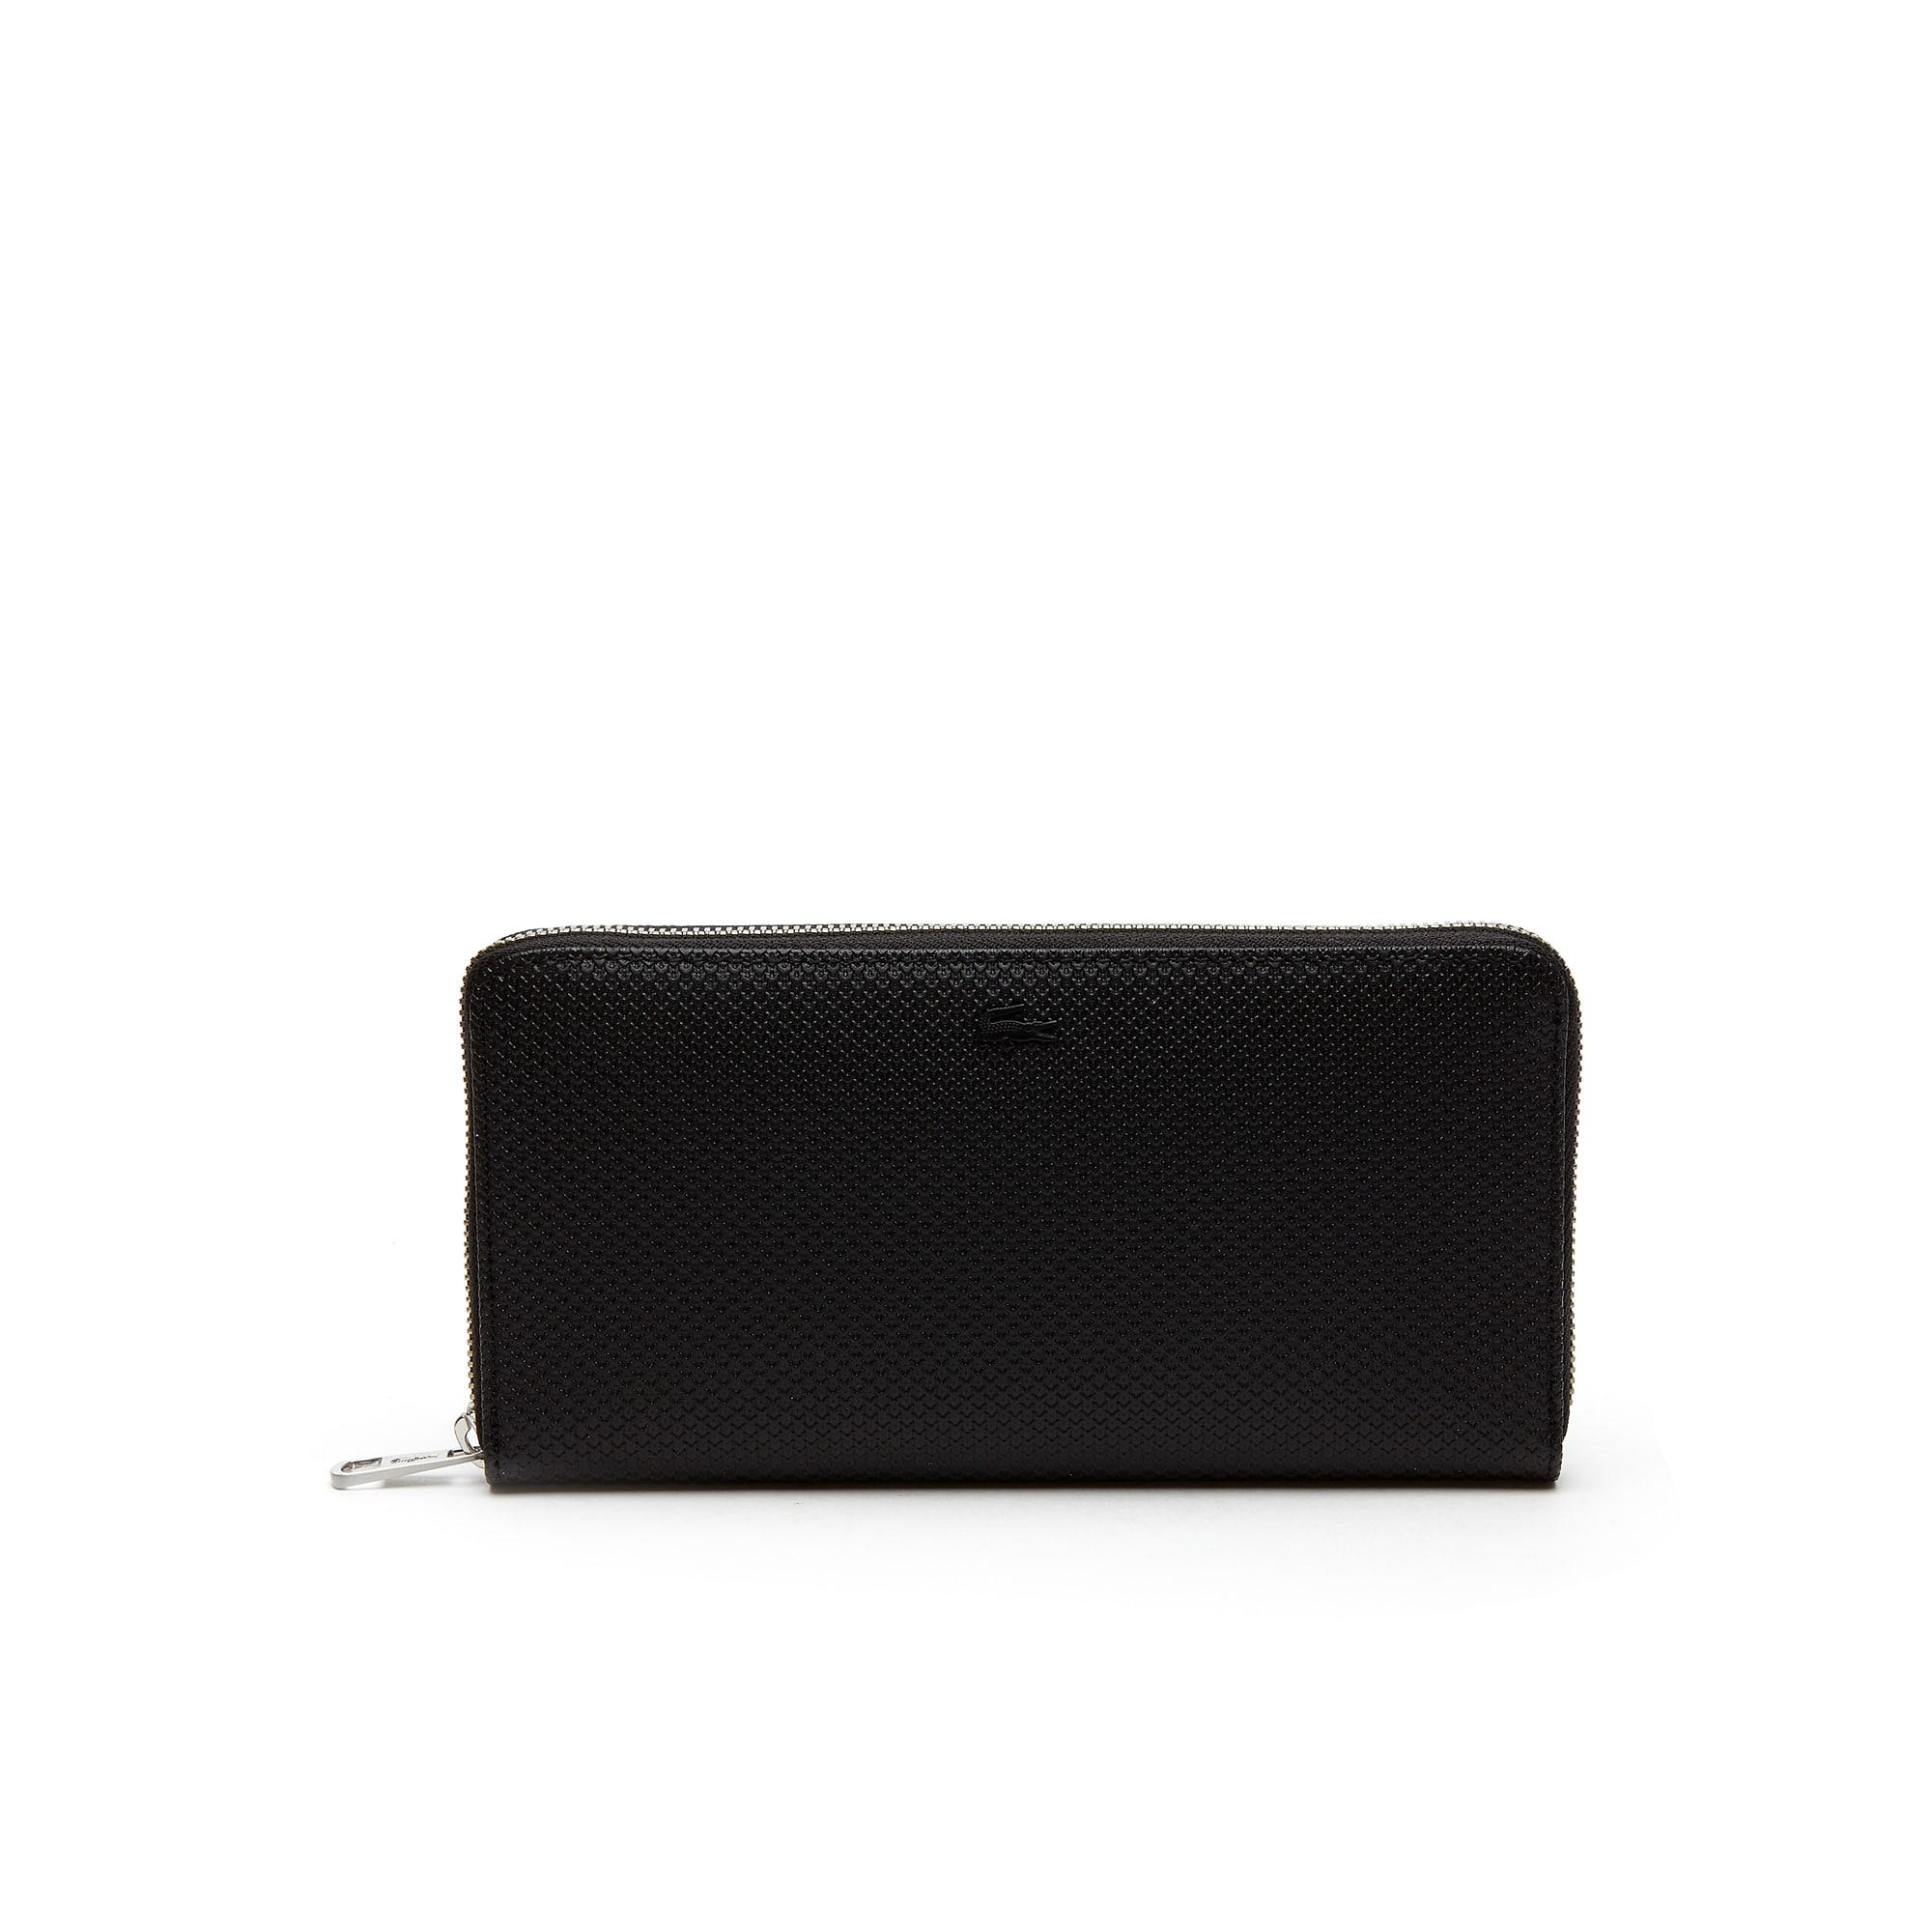 Men's Chantaco Piqué Leather 16 Card Zip Wallet